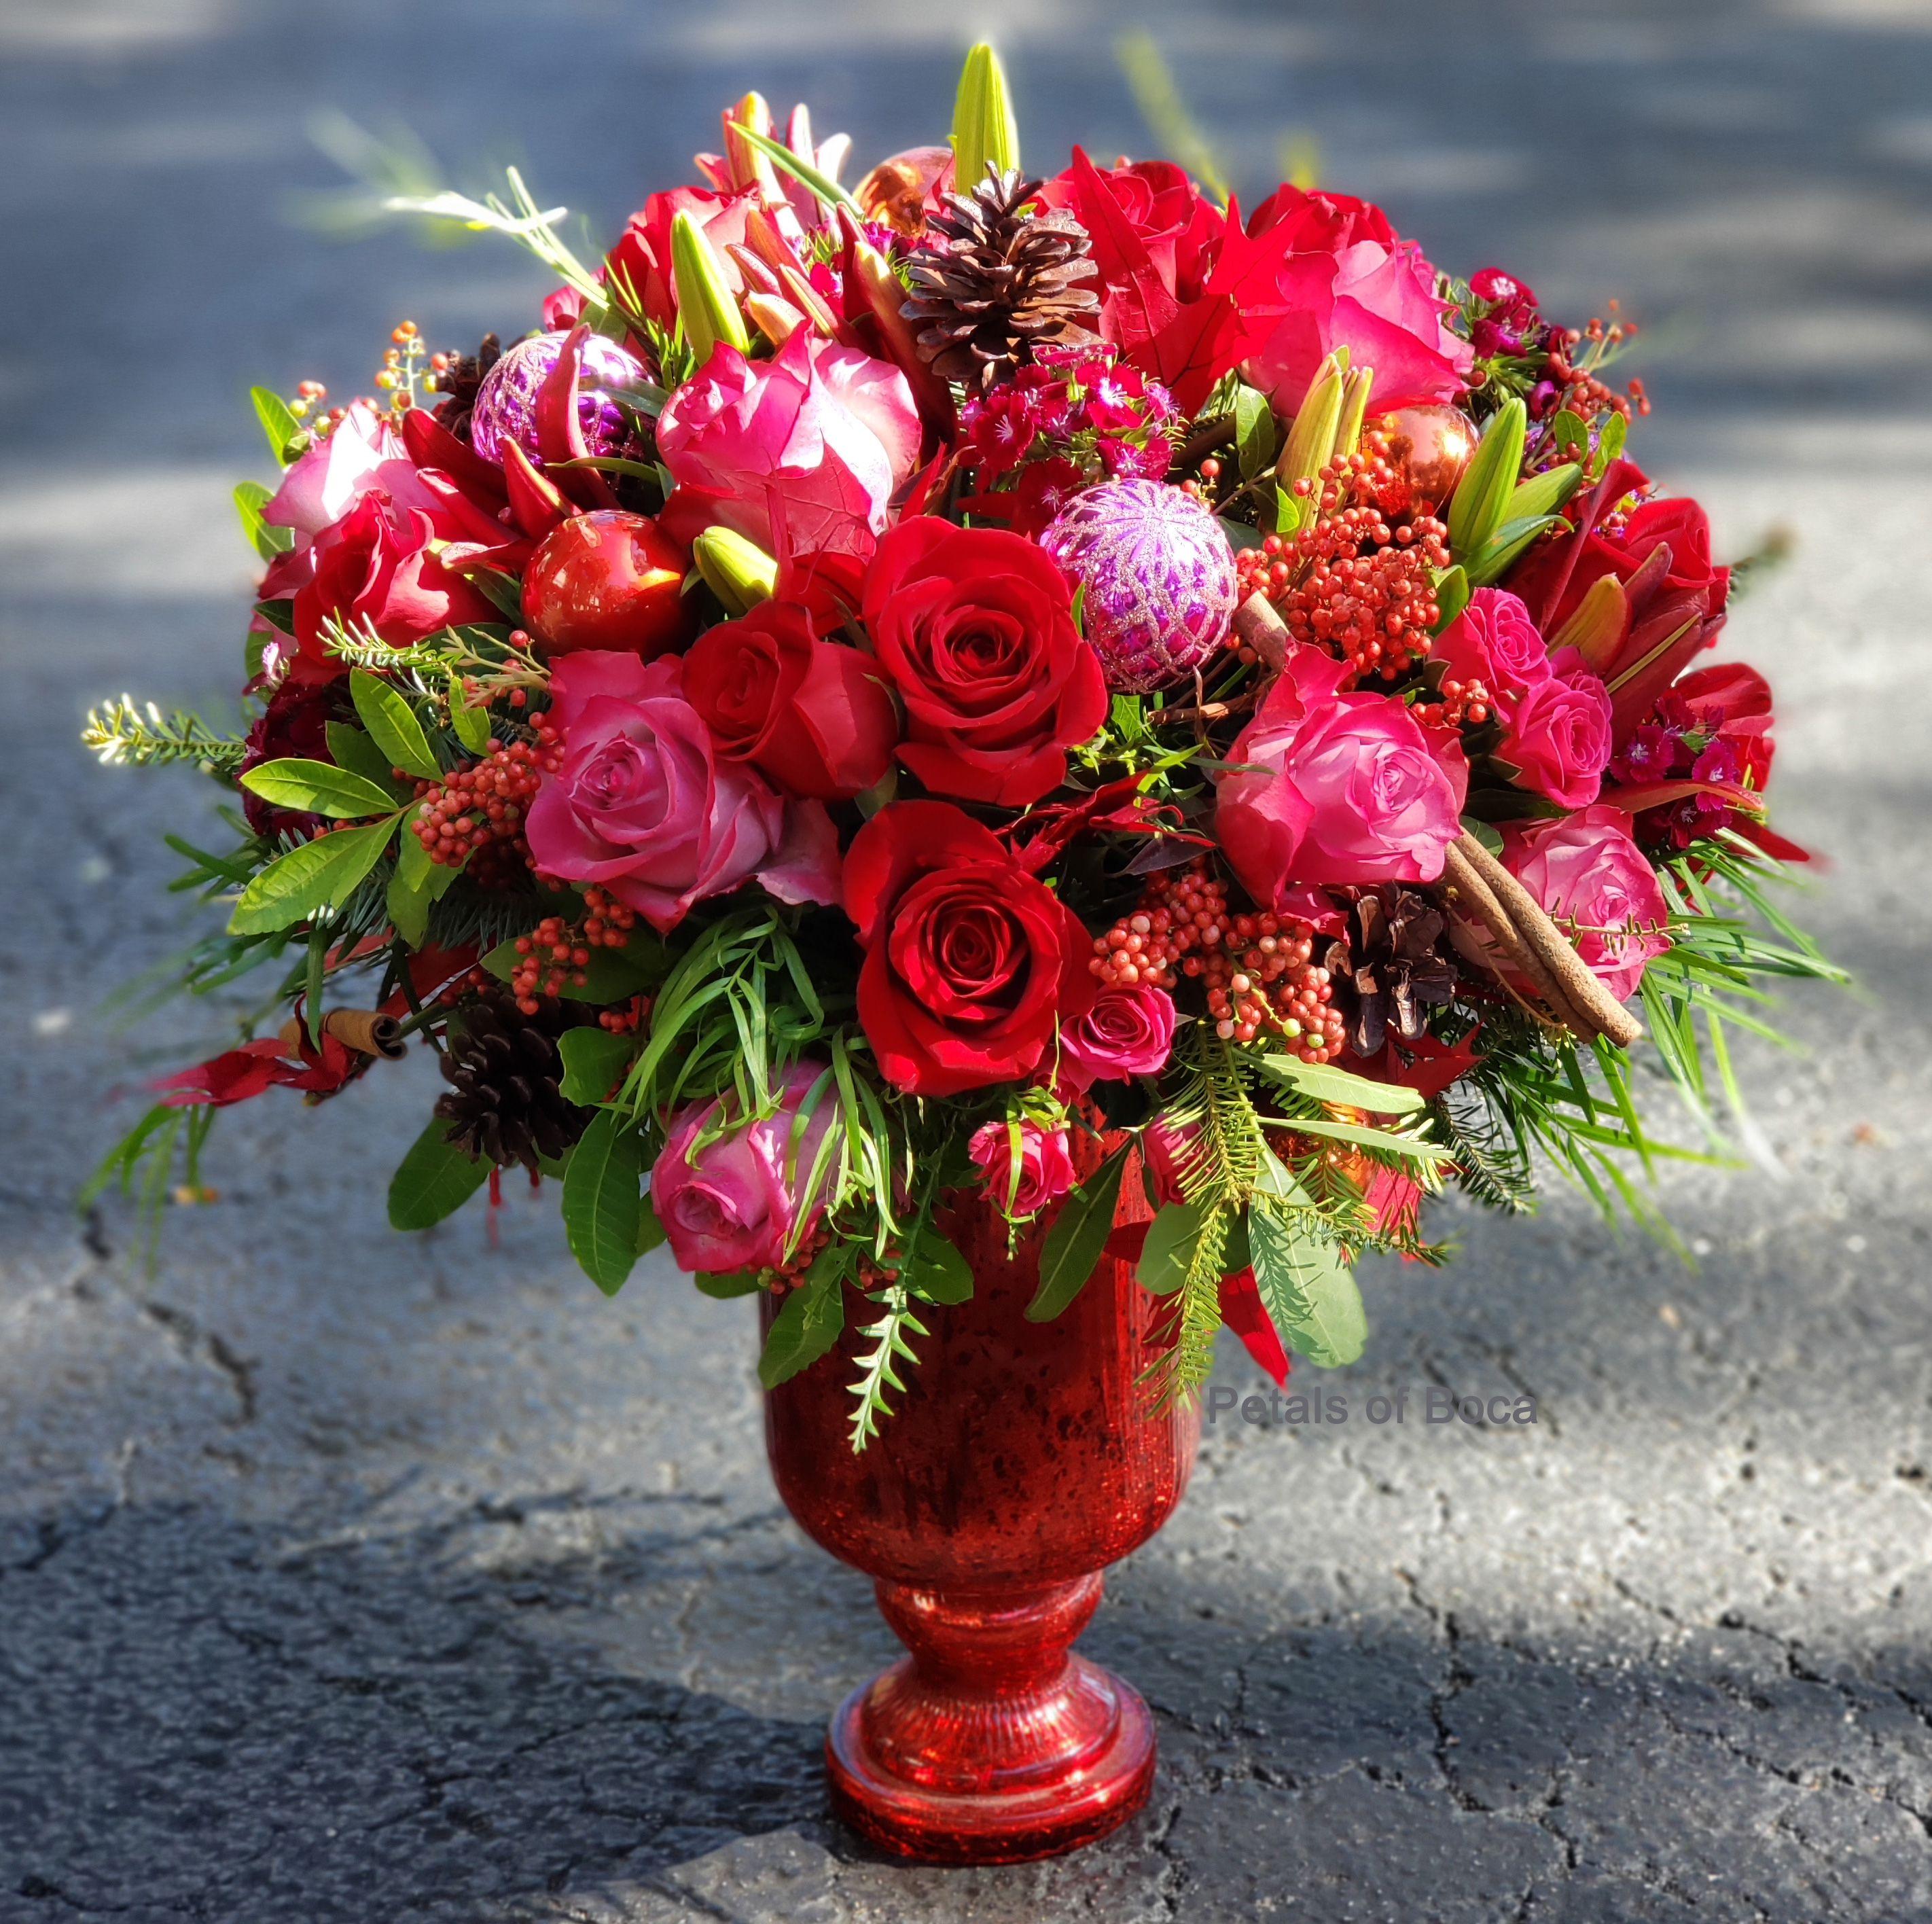 Romantic Christmas Flower Arrangement in 2020 Christmas